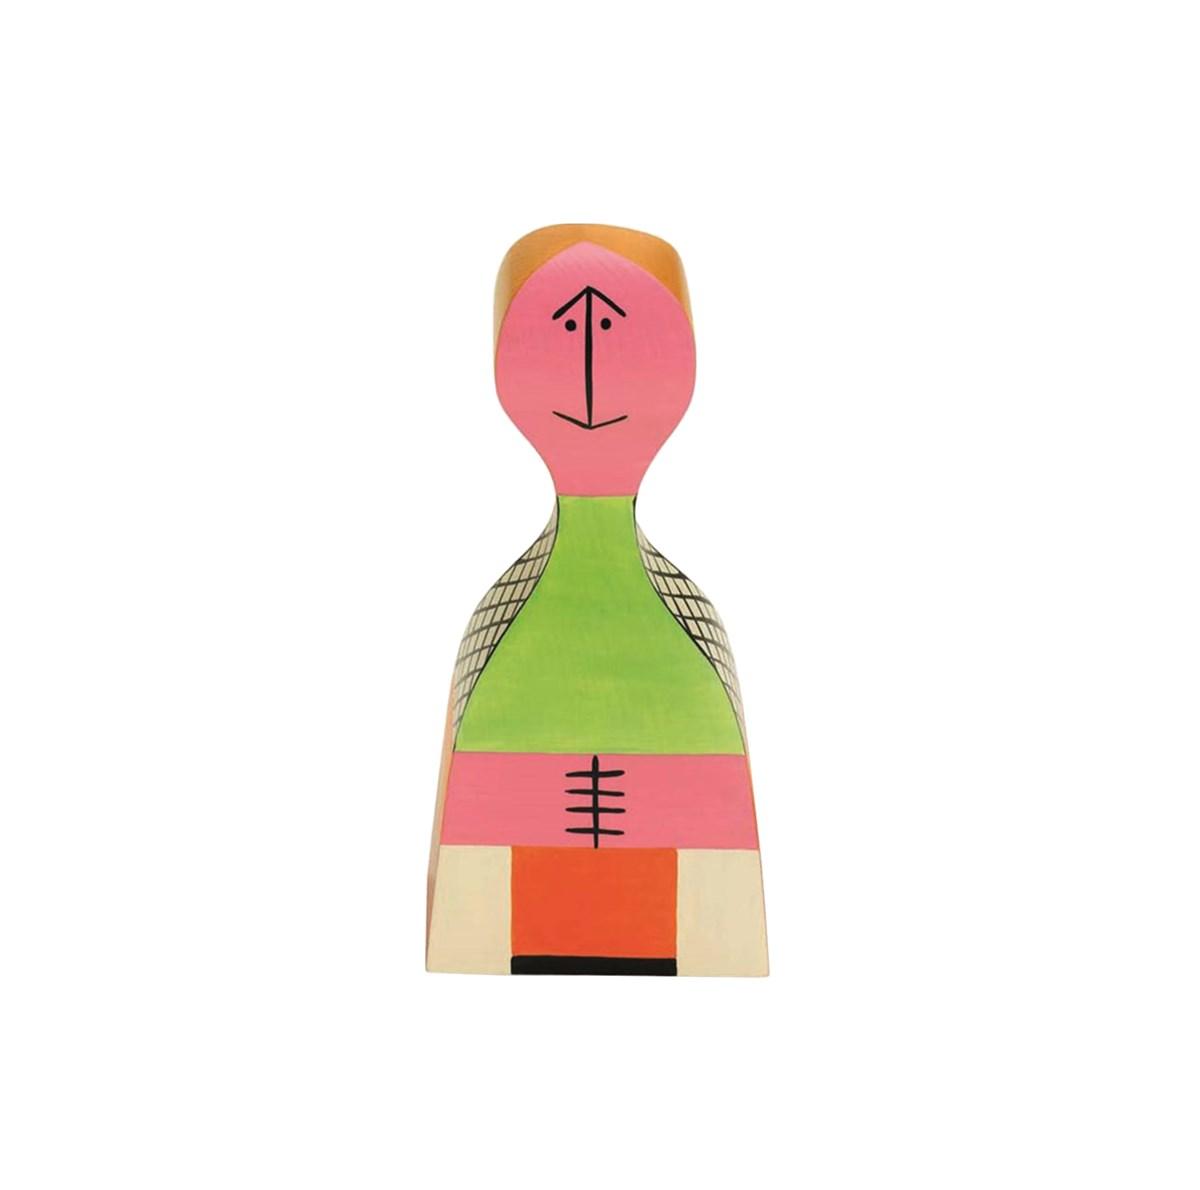 Vitra-Alexander-Girard-Wooden-Doll-No.19-Matisse-1